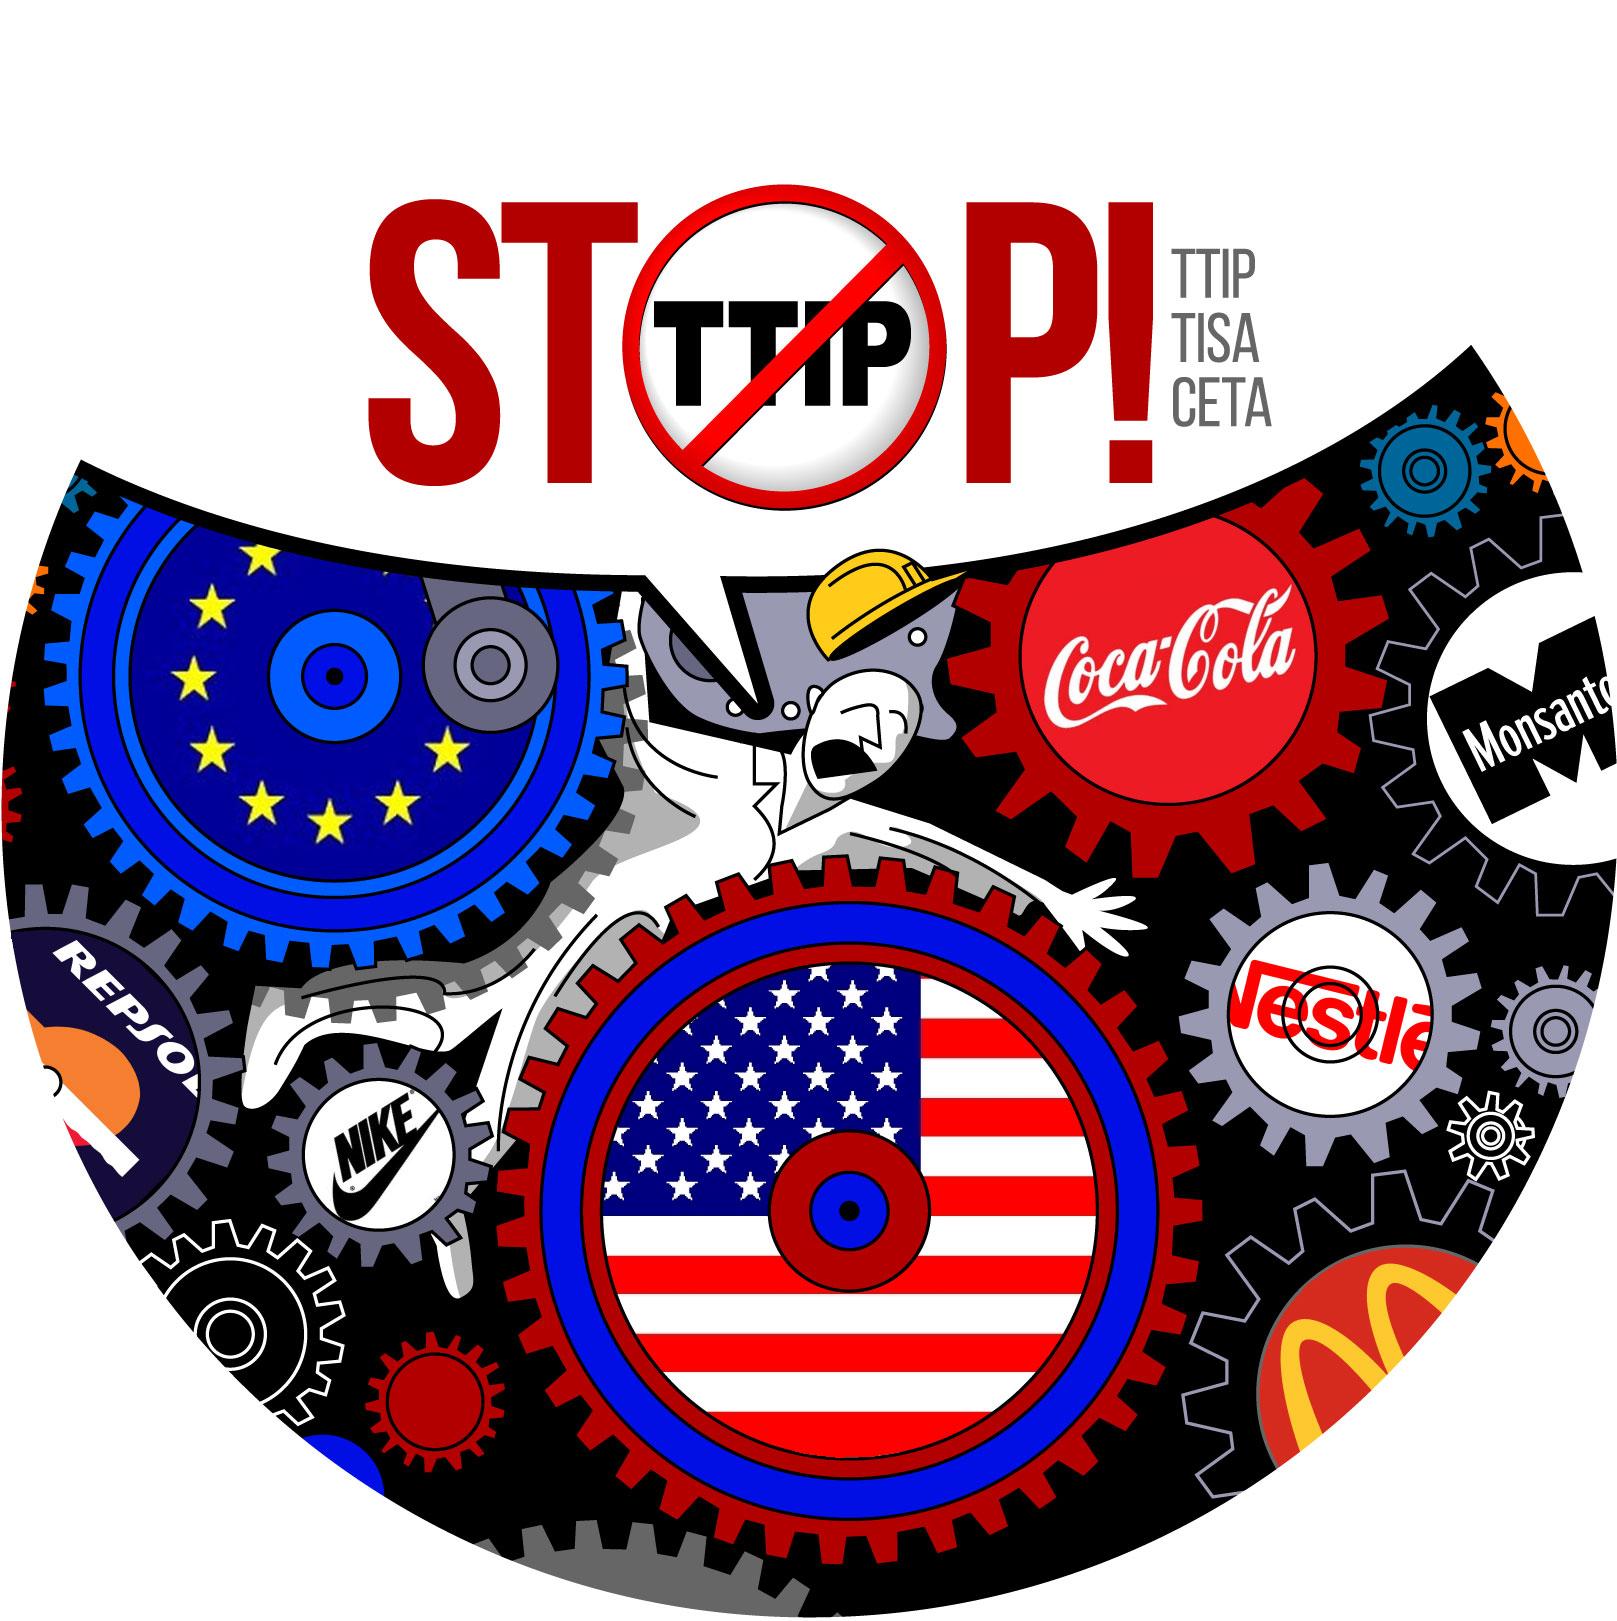 TTIP-ellenes grafika. Forrás: Flickr